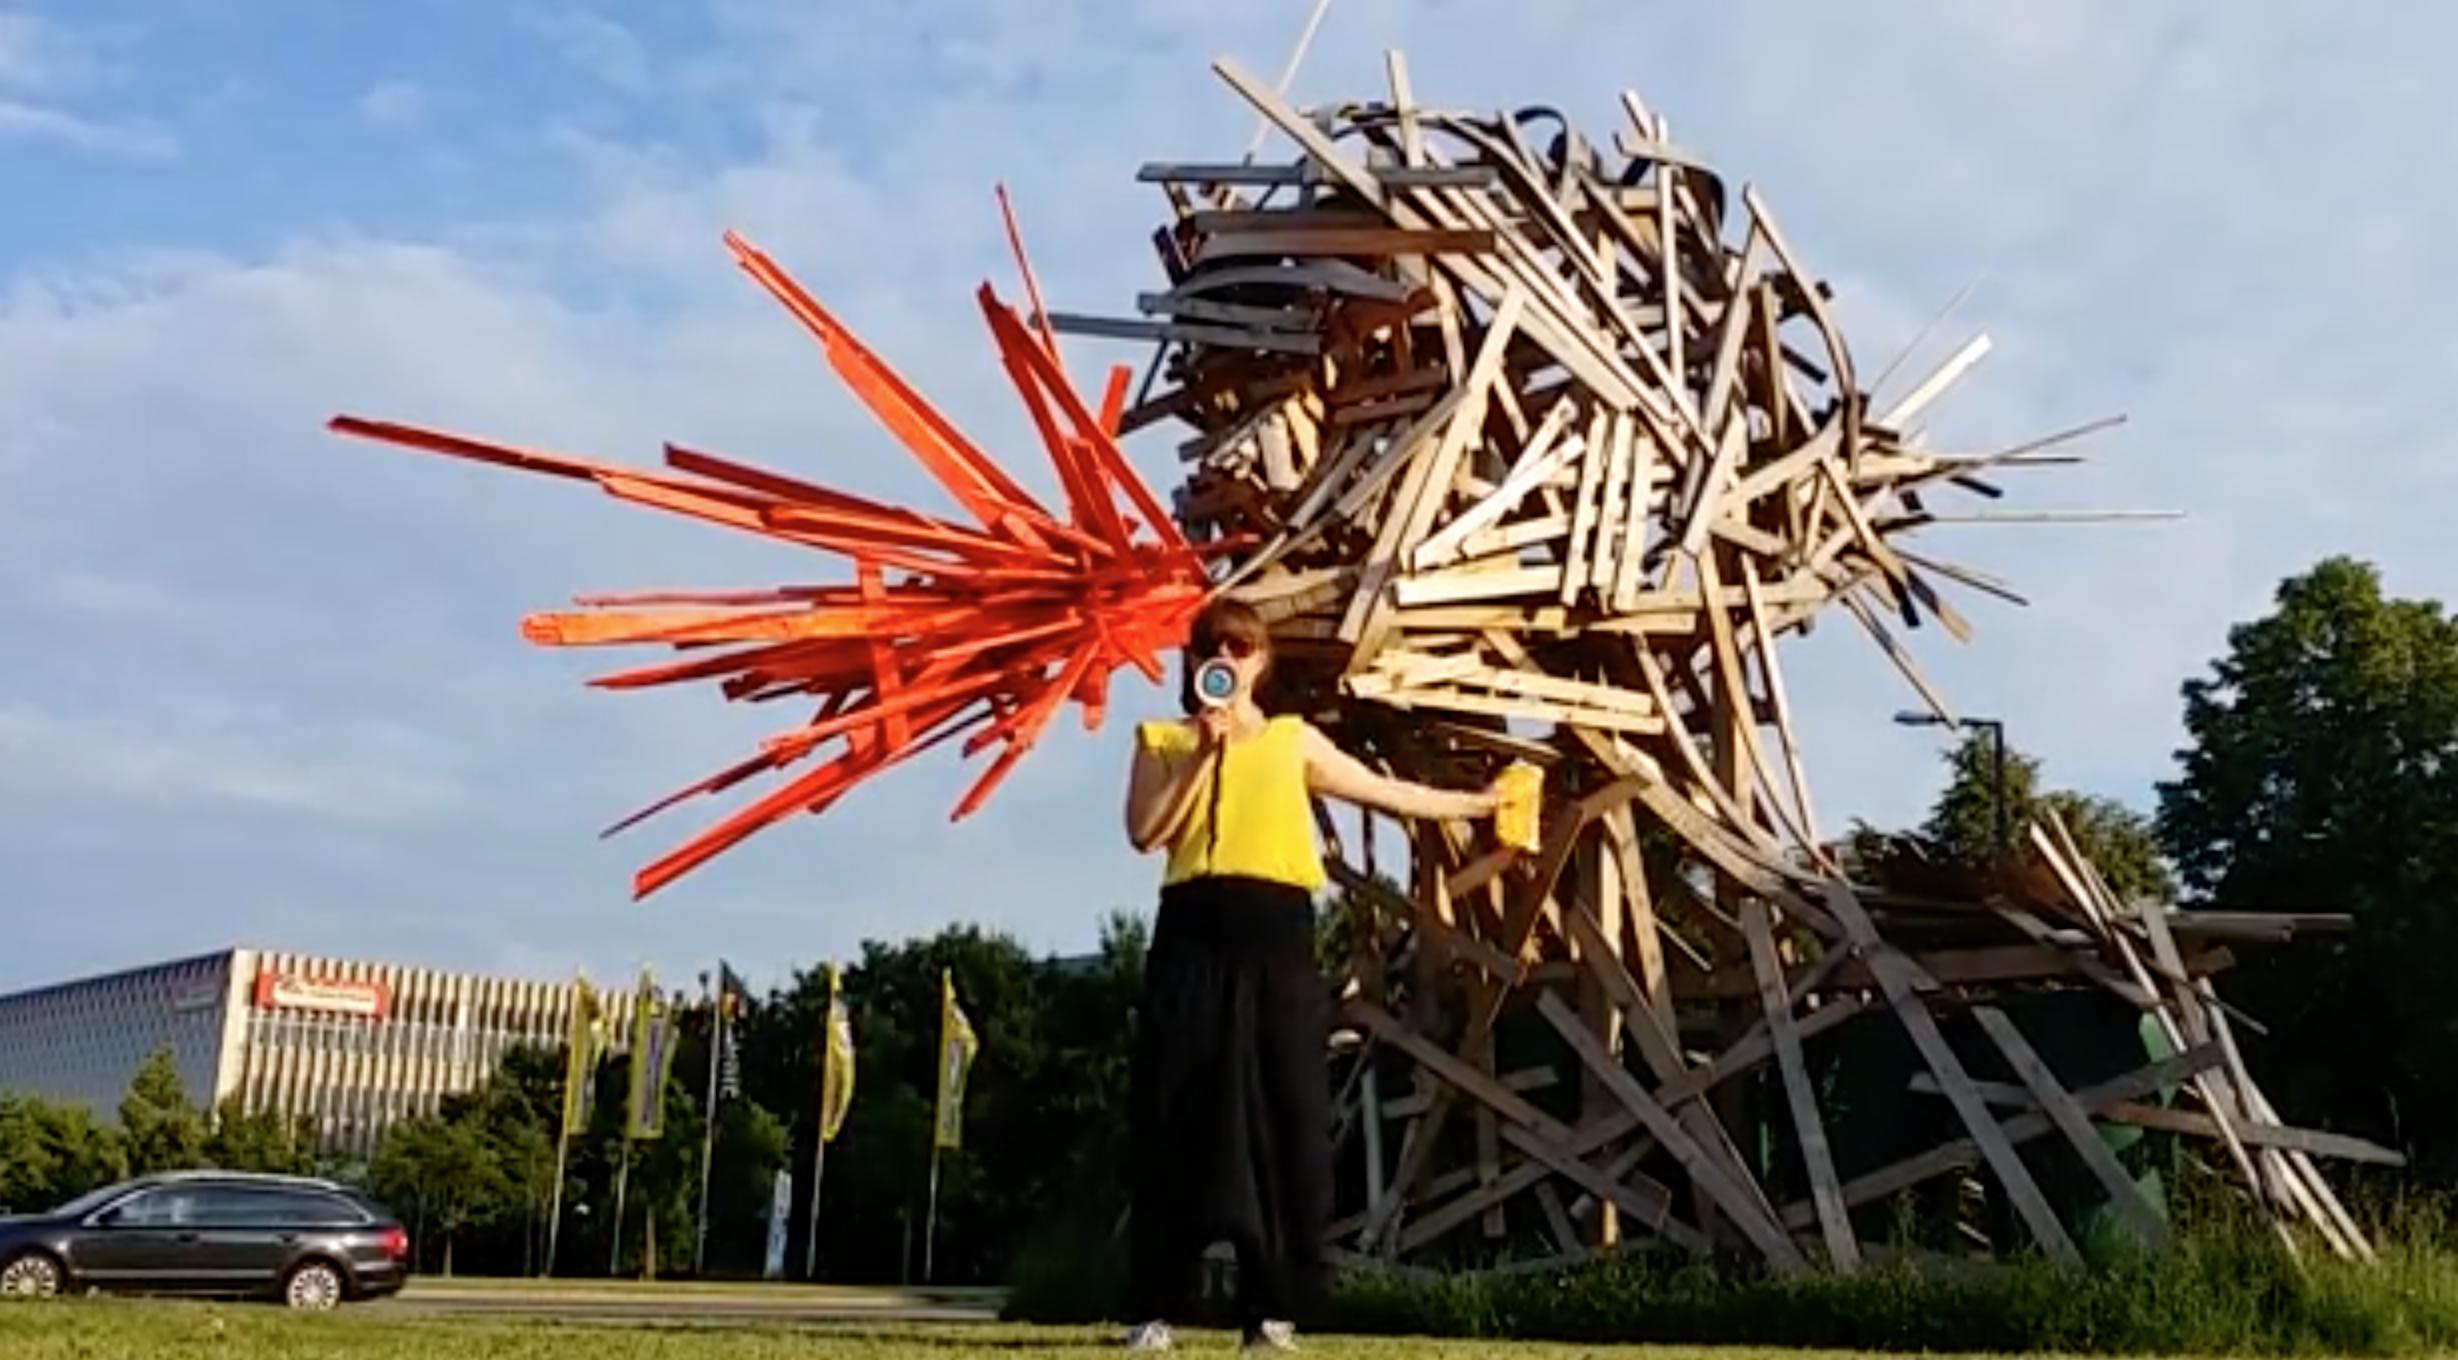 Besprechung der Skulptur Amalia